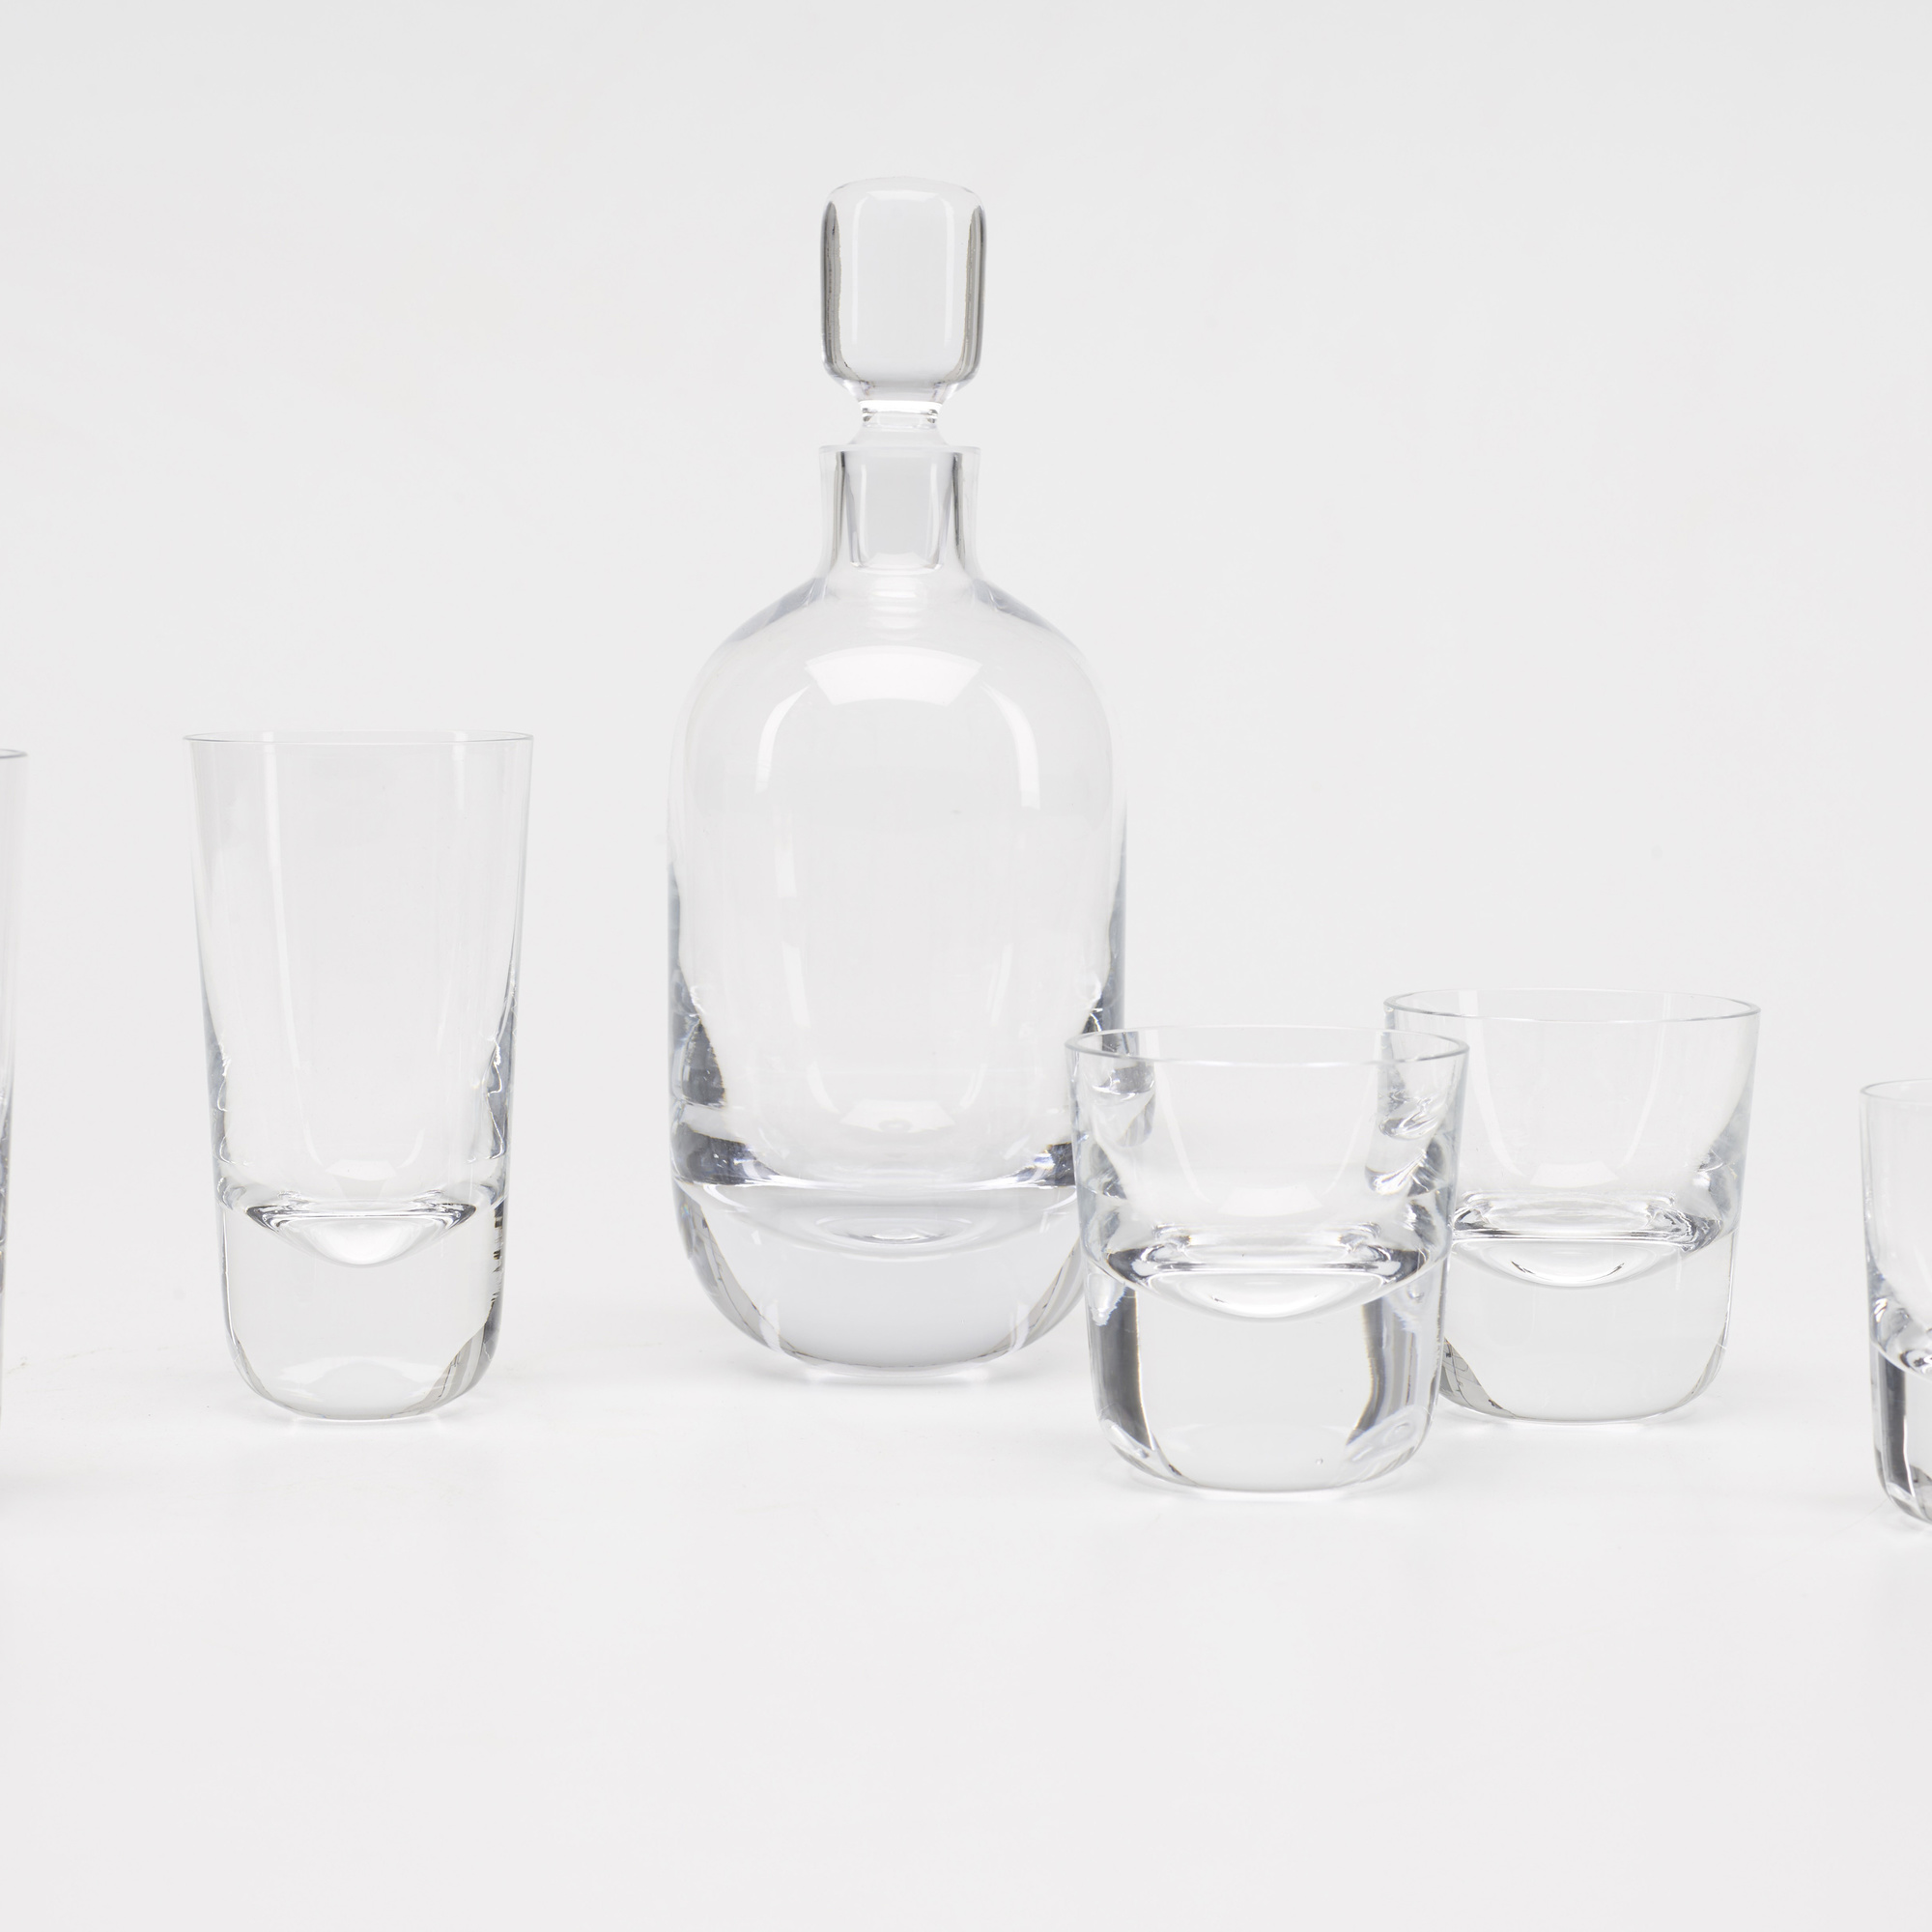 246: Duncan & Miller Glass Co. / glassware set (2 of 2)